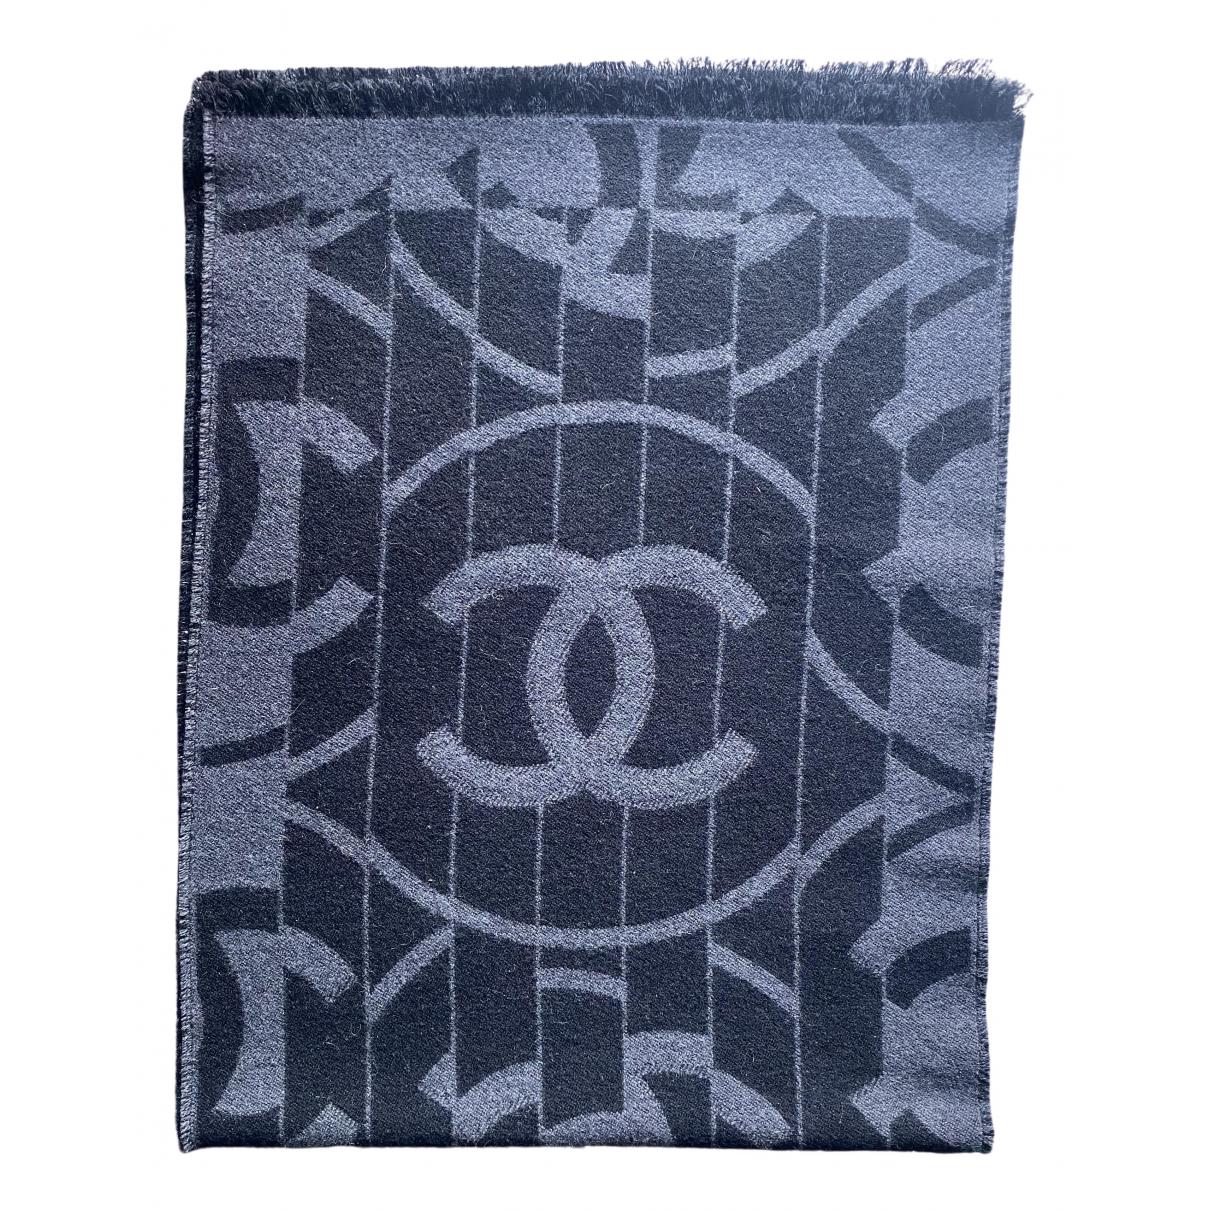 Chanel \N Wool scarf for Women \N